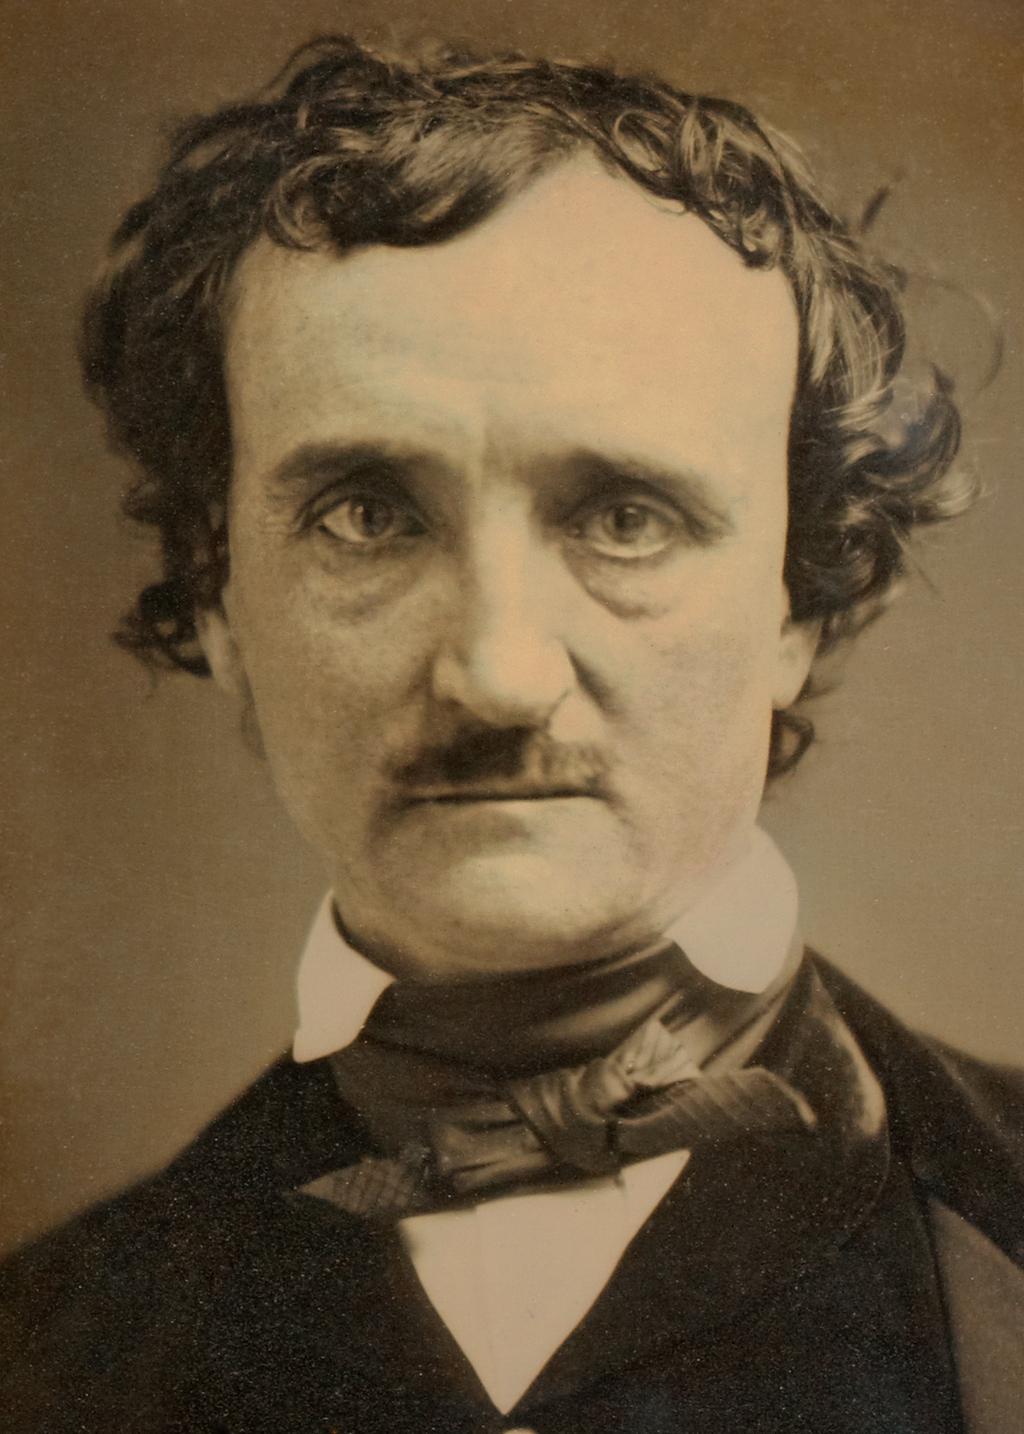 An 1849 daguerreotype of Edgar Allan Poe.